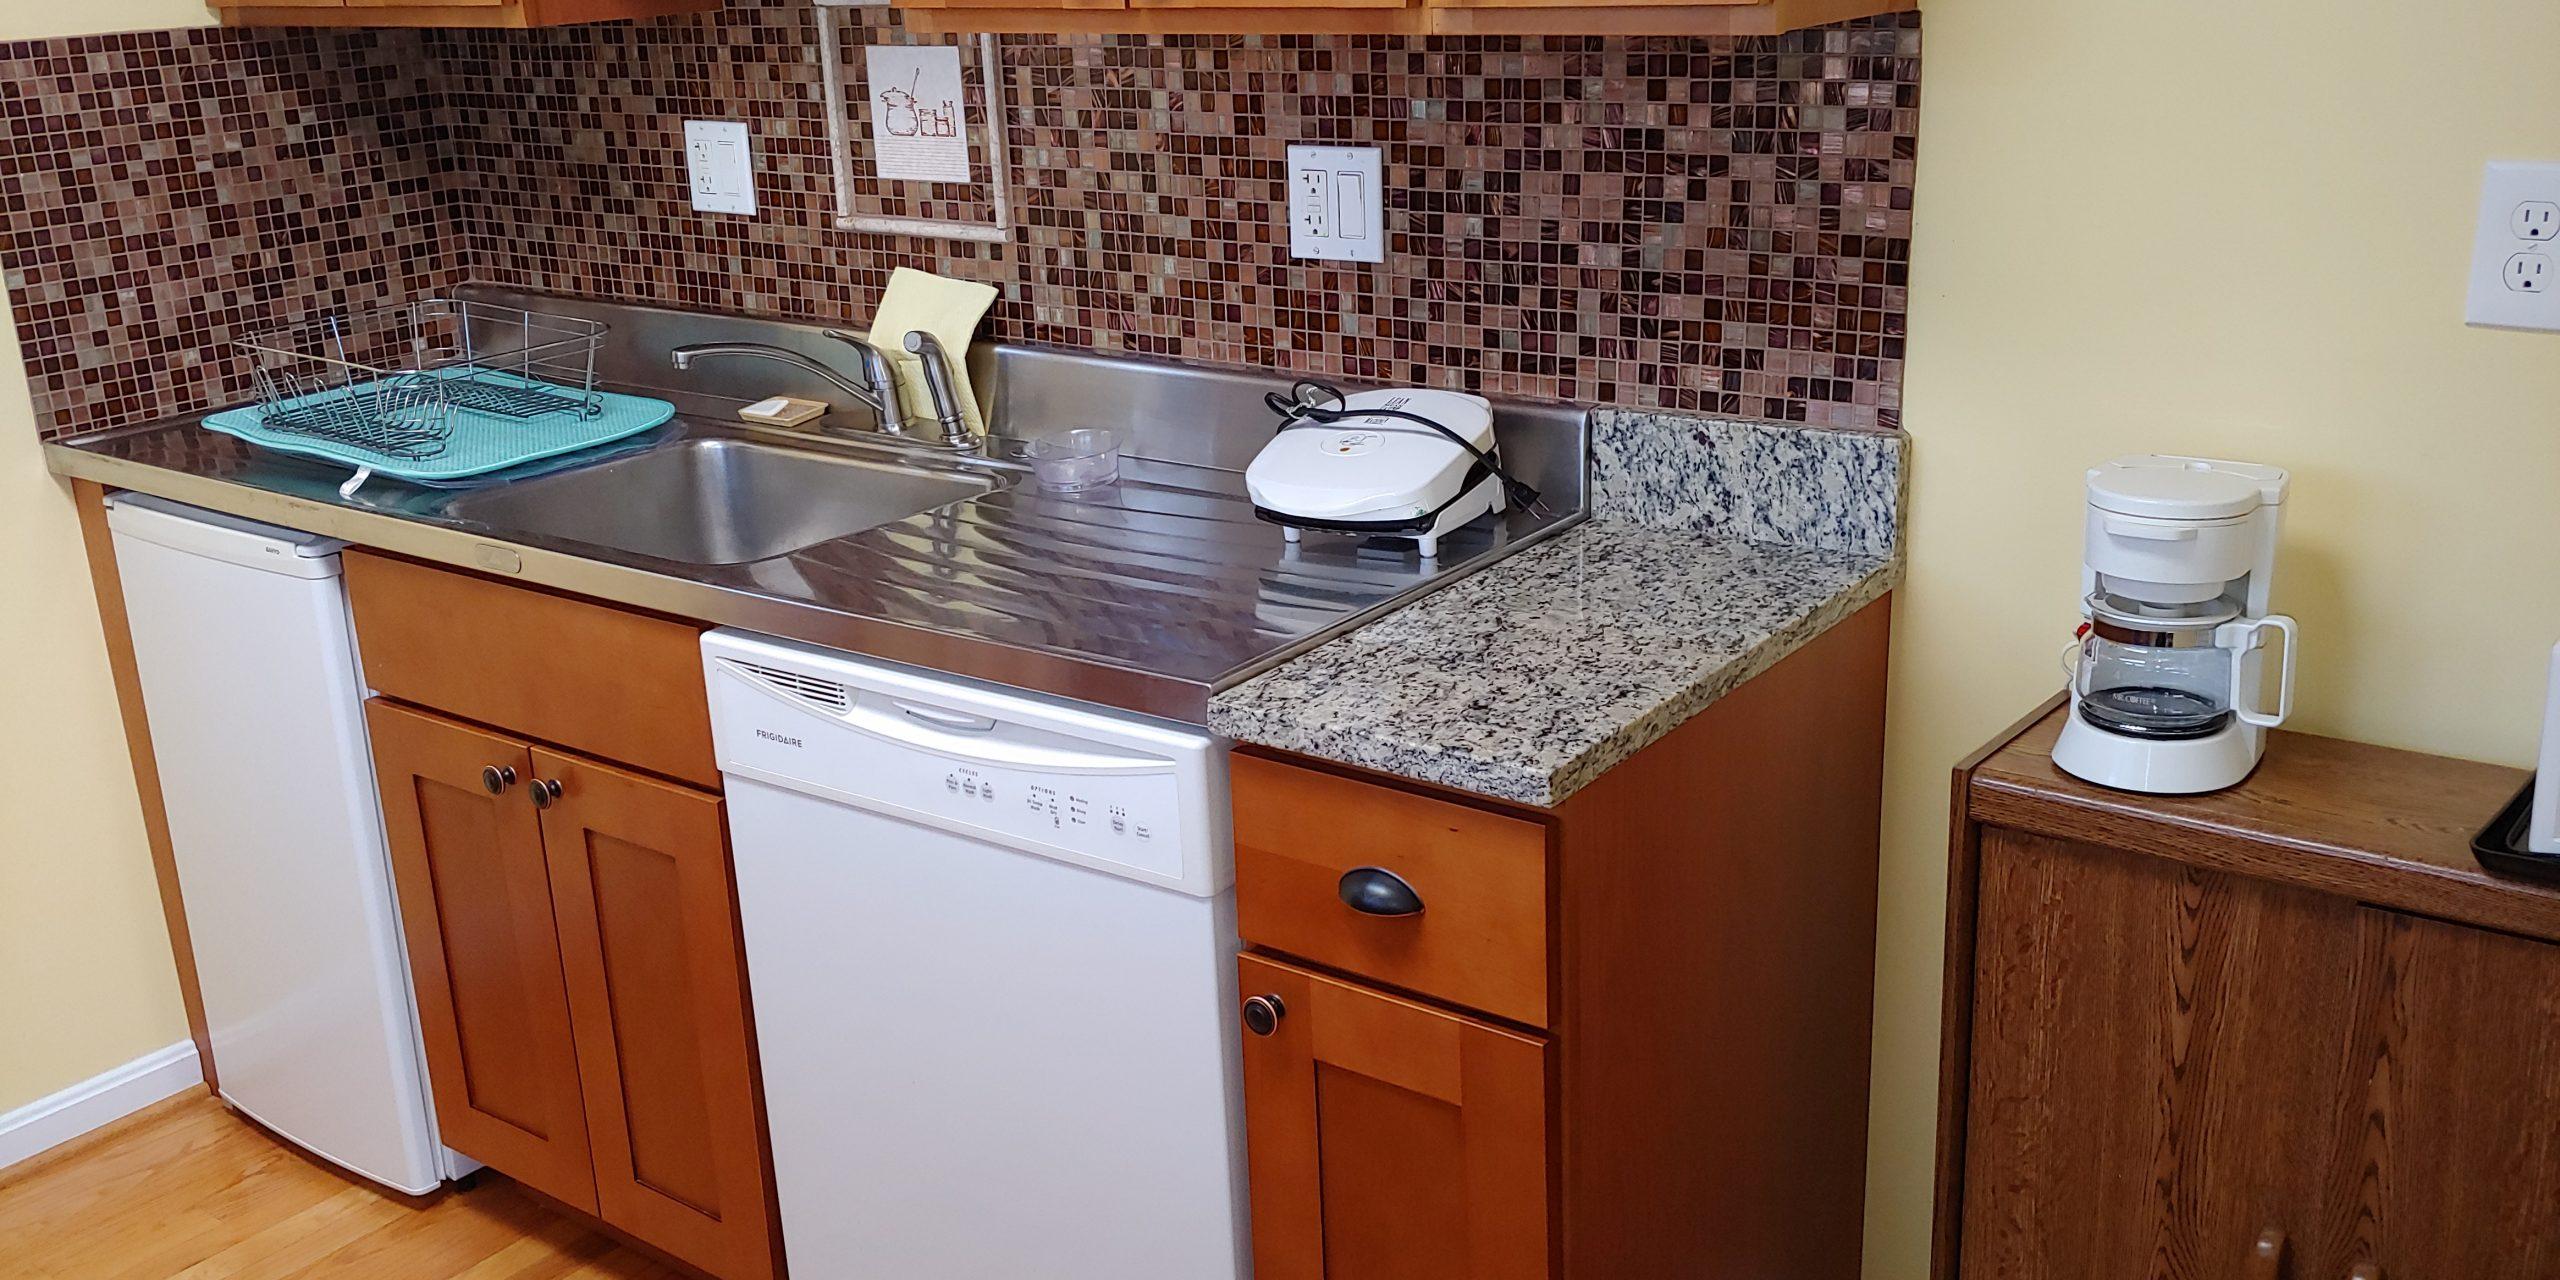 Dishwasher, Forman grill, coffee maker, fridge